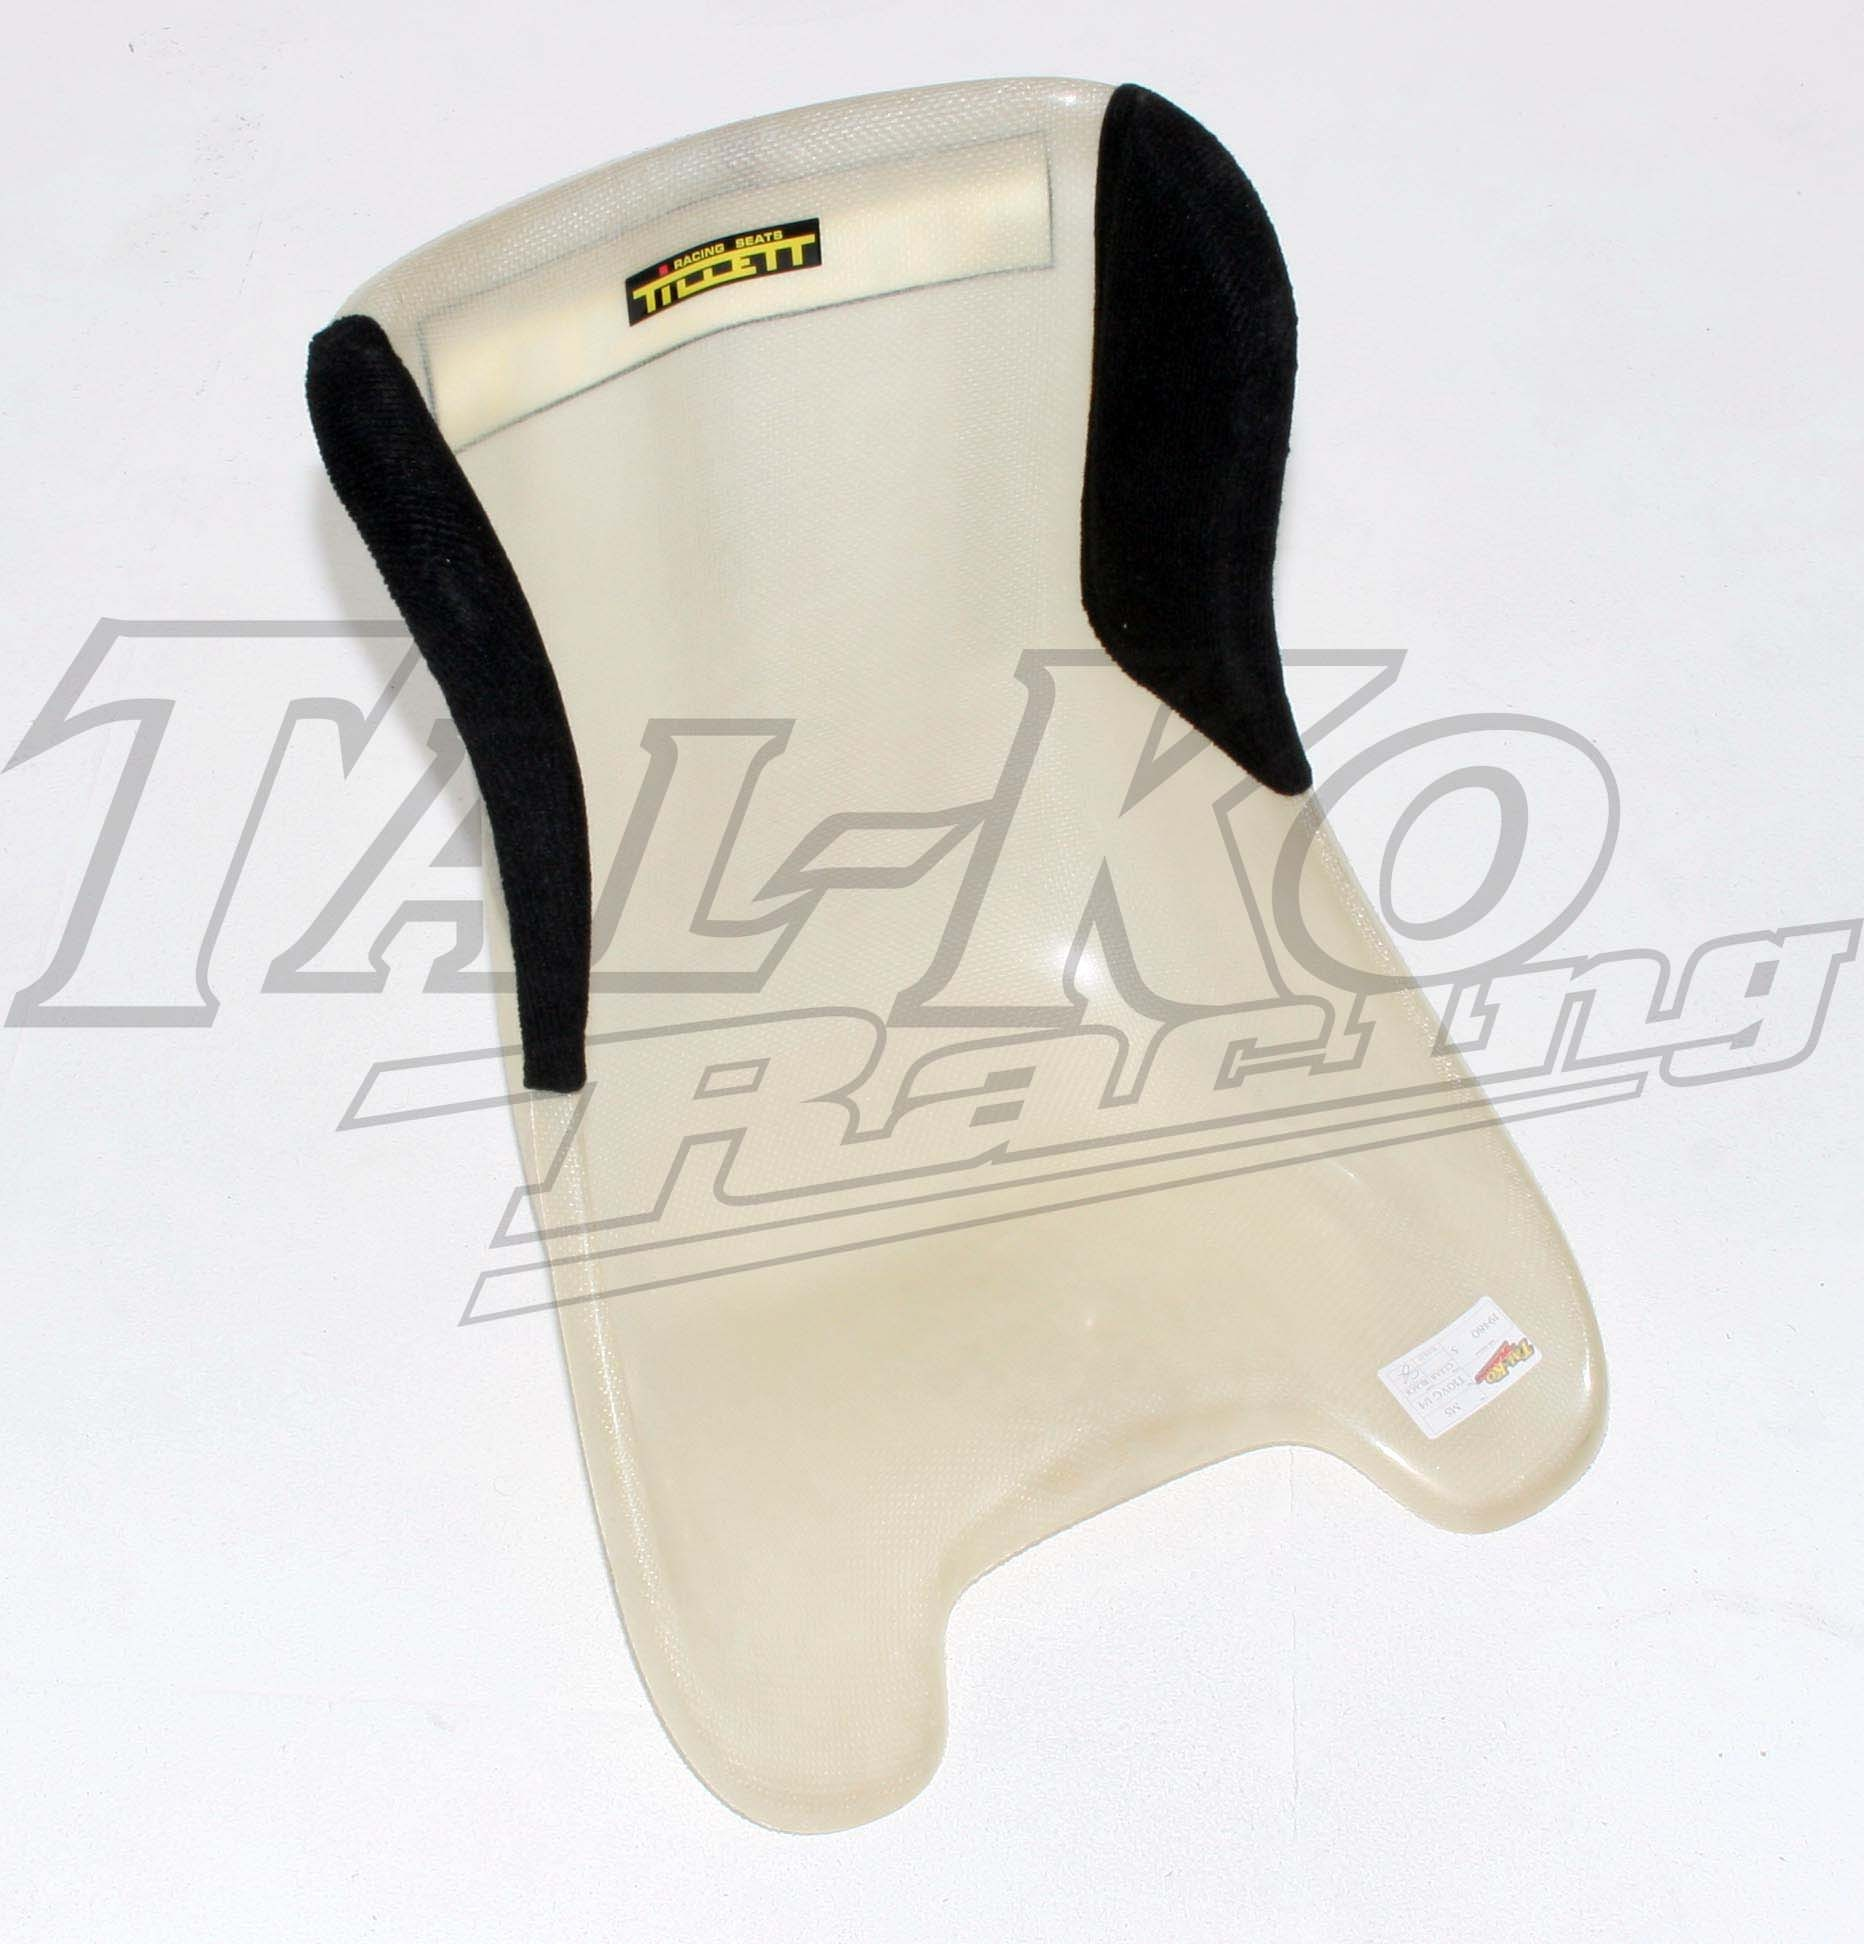 TILLETT RACING SEAT T10VG 1/4 MS